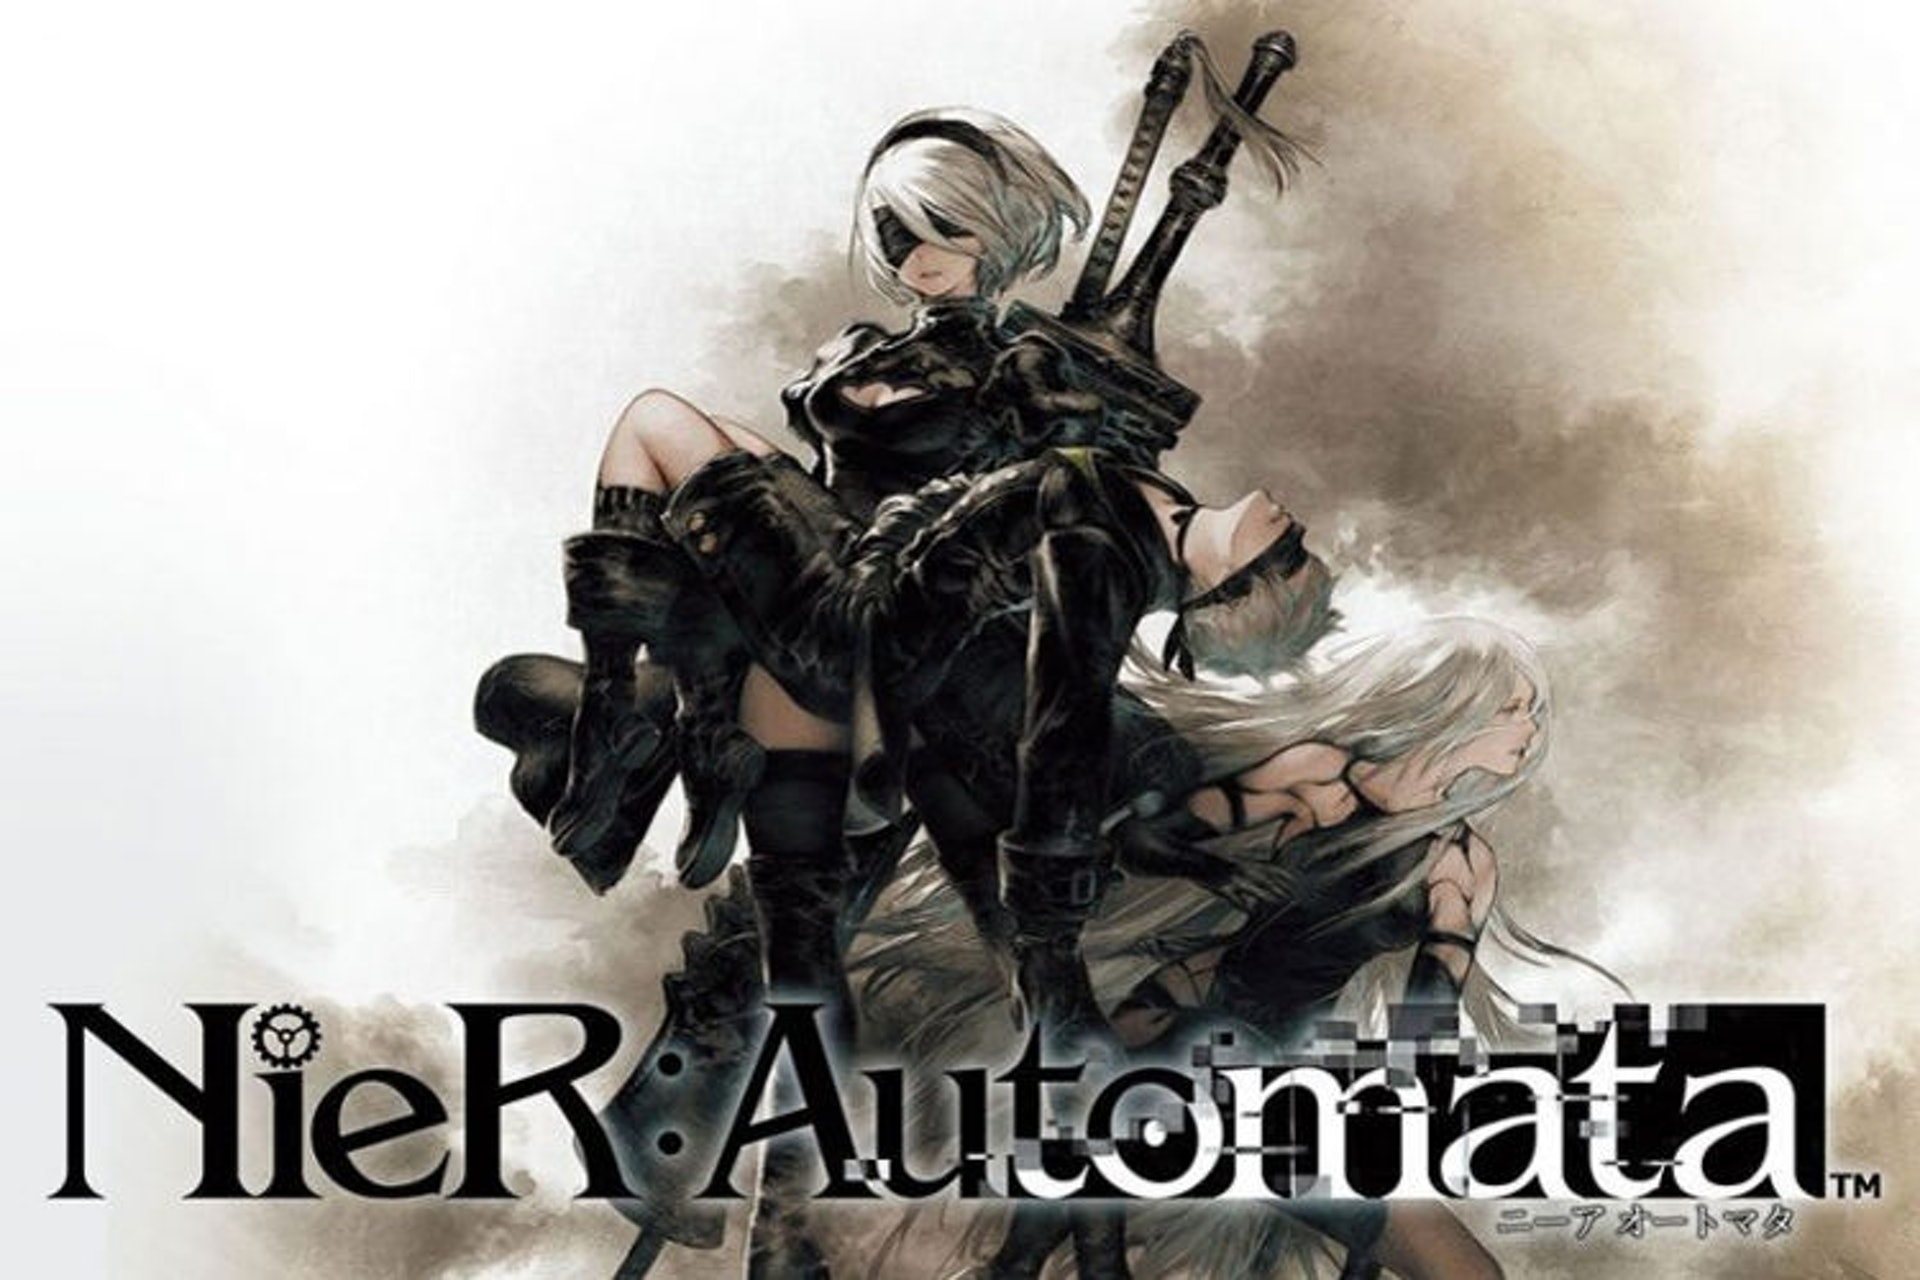 [ARPG]尼爾:自動人形 – 中日英韓文版(漢化@PC@OD@)